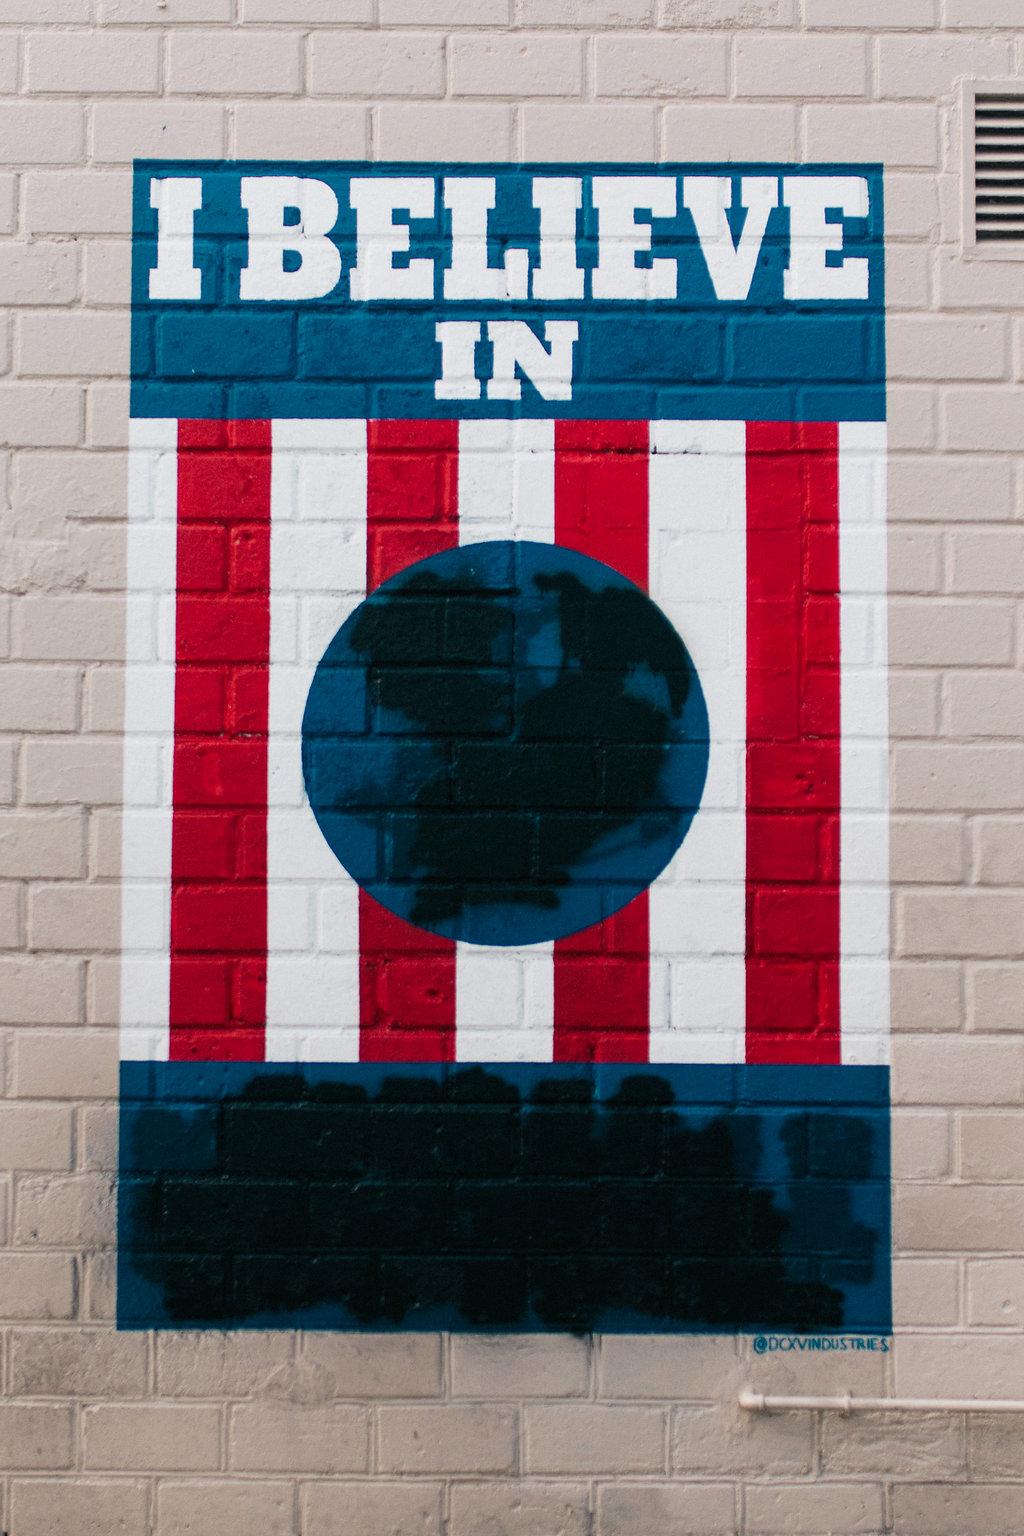 I-Believe-In-Nashville-Vandalized-12th-South-14